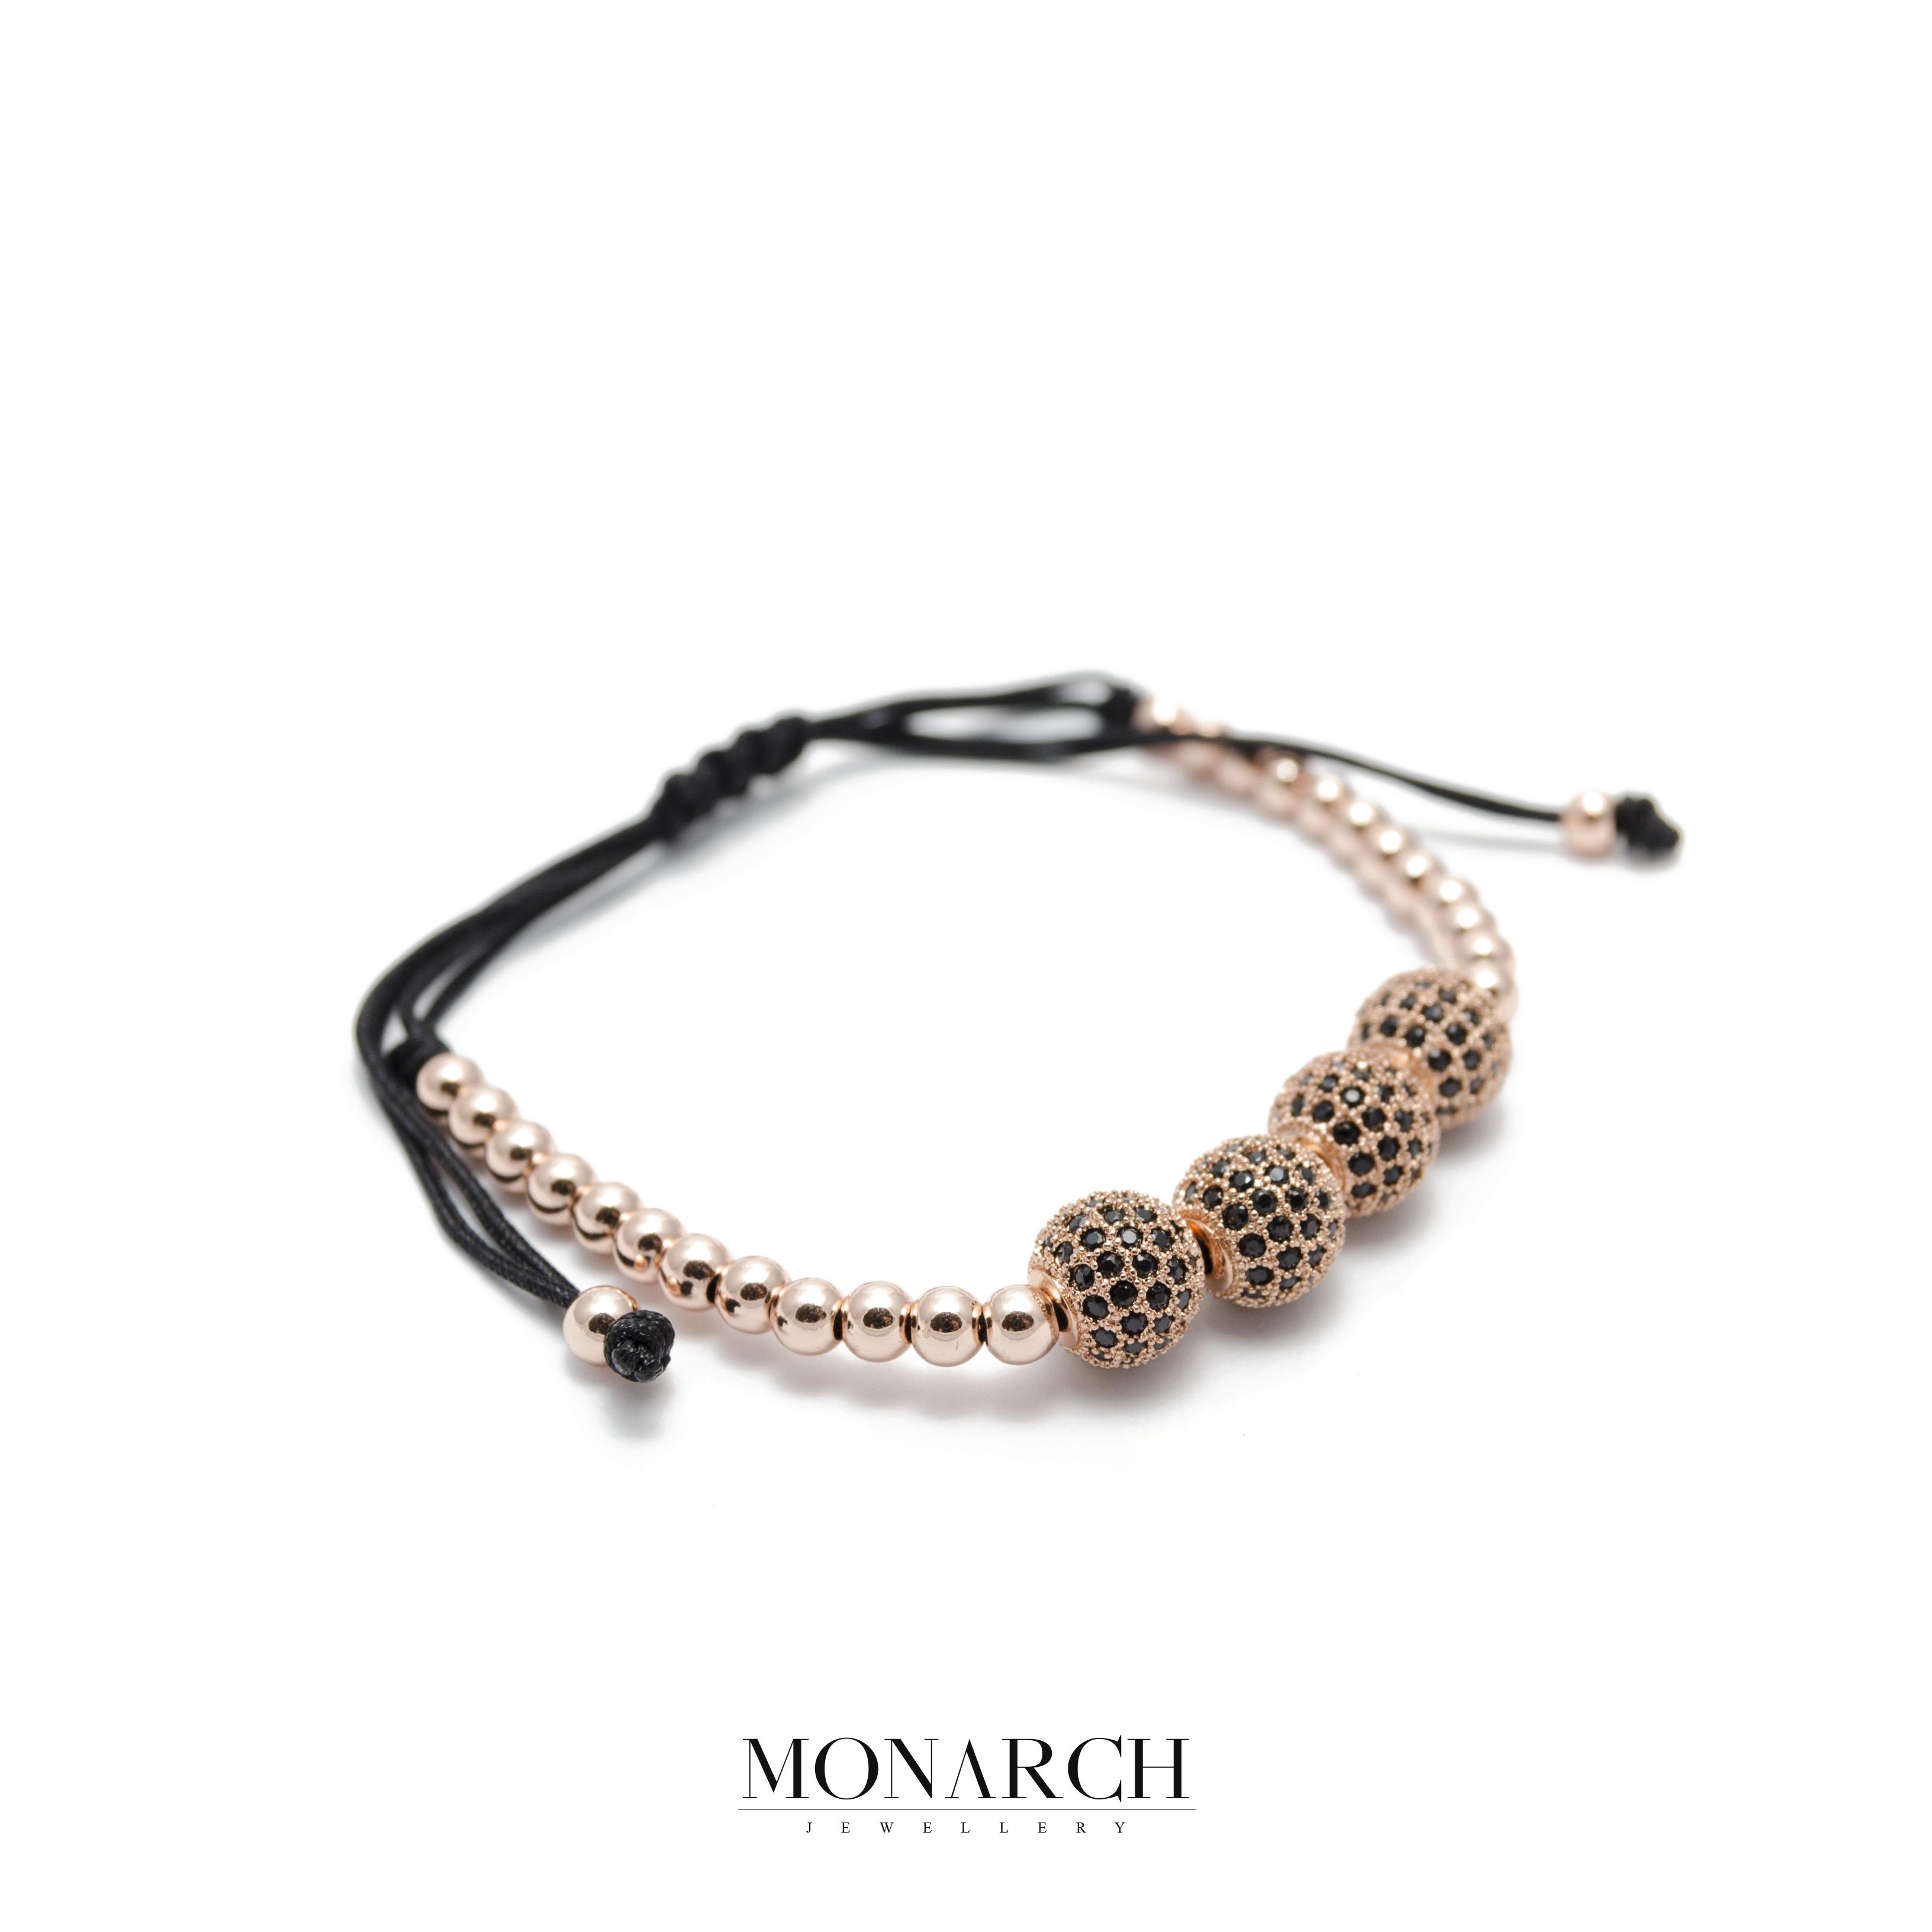 Monarch Jewellery Bratara Luxury 24K Gold Rose Zircon Quatro Bead